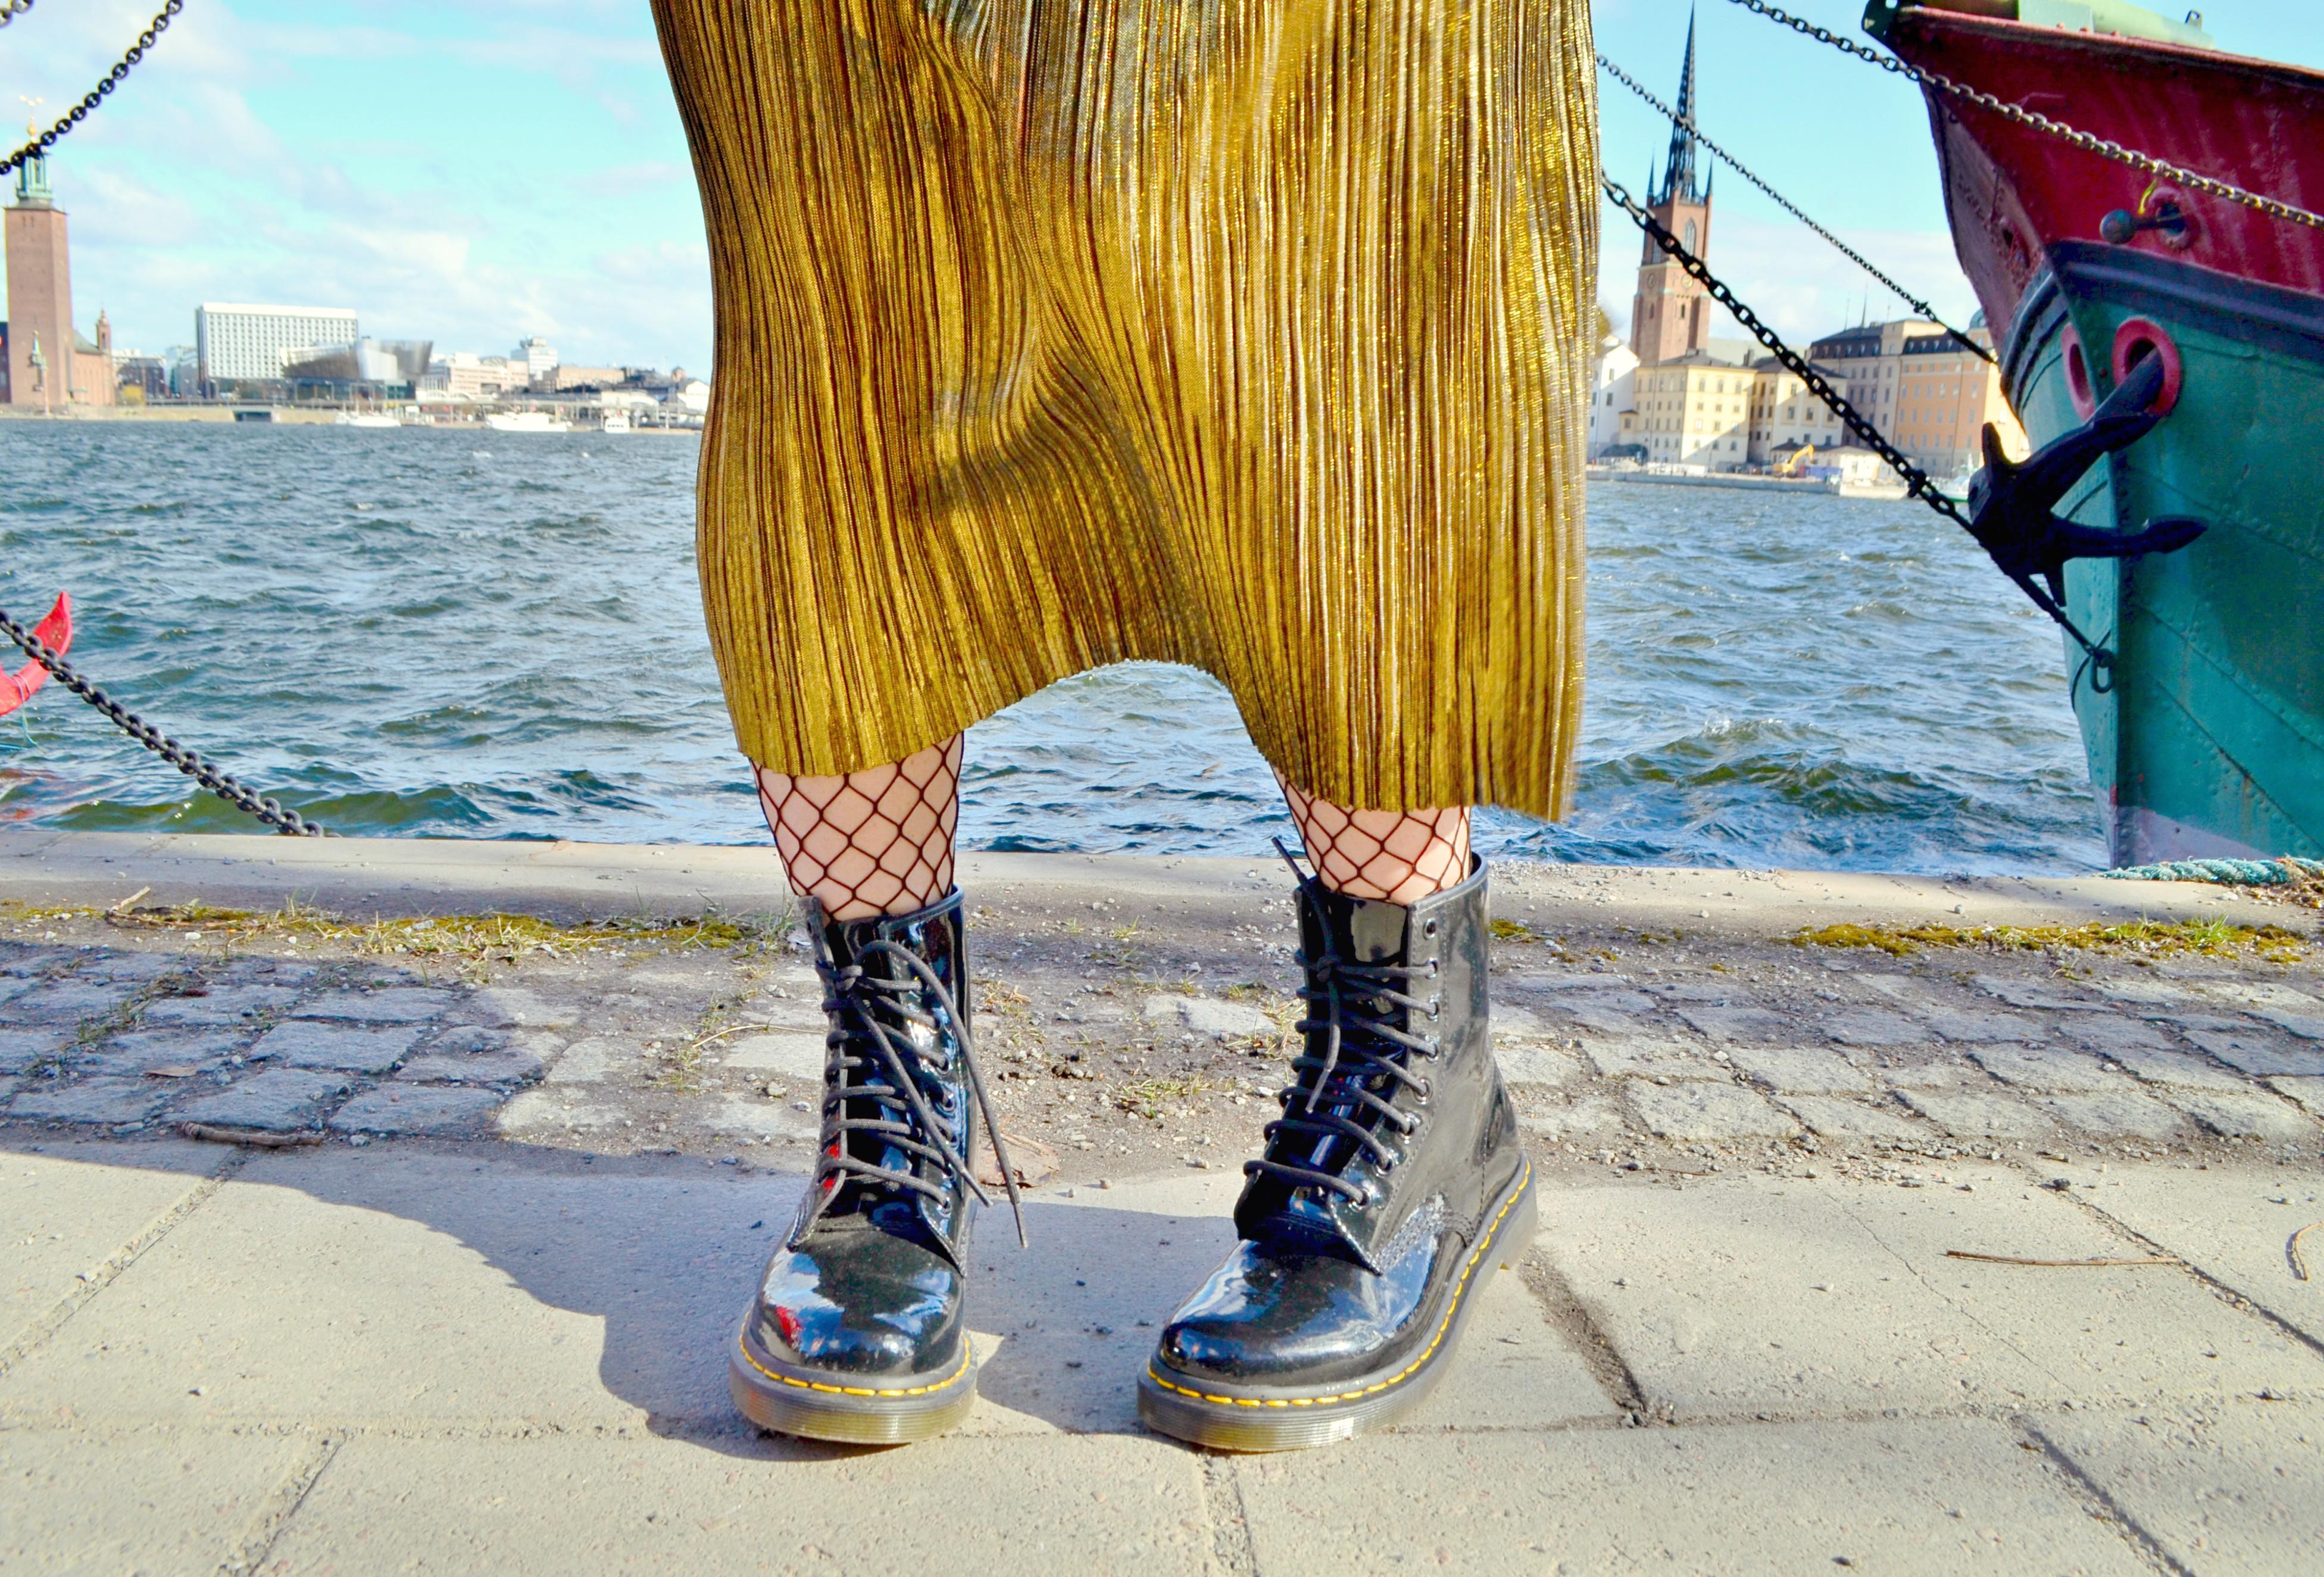 DrMartens-look-ChicAdicta-blog-de-moda-influencer-Chic-Adicta-falda-dorada-fashion-travel-PiensaenChic-Piensa-en-Chic